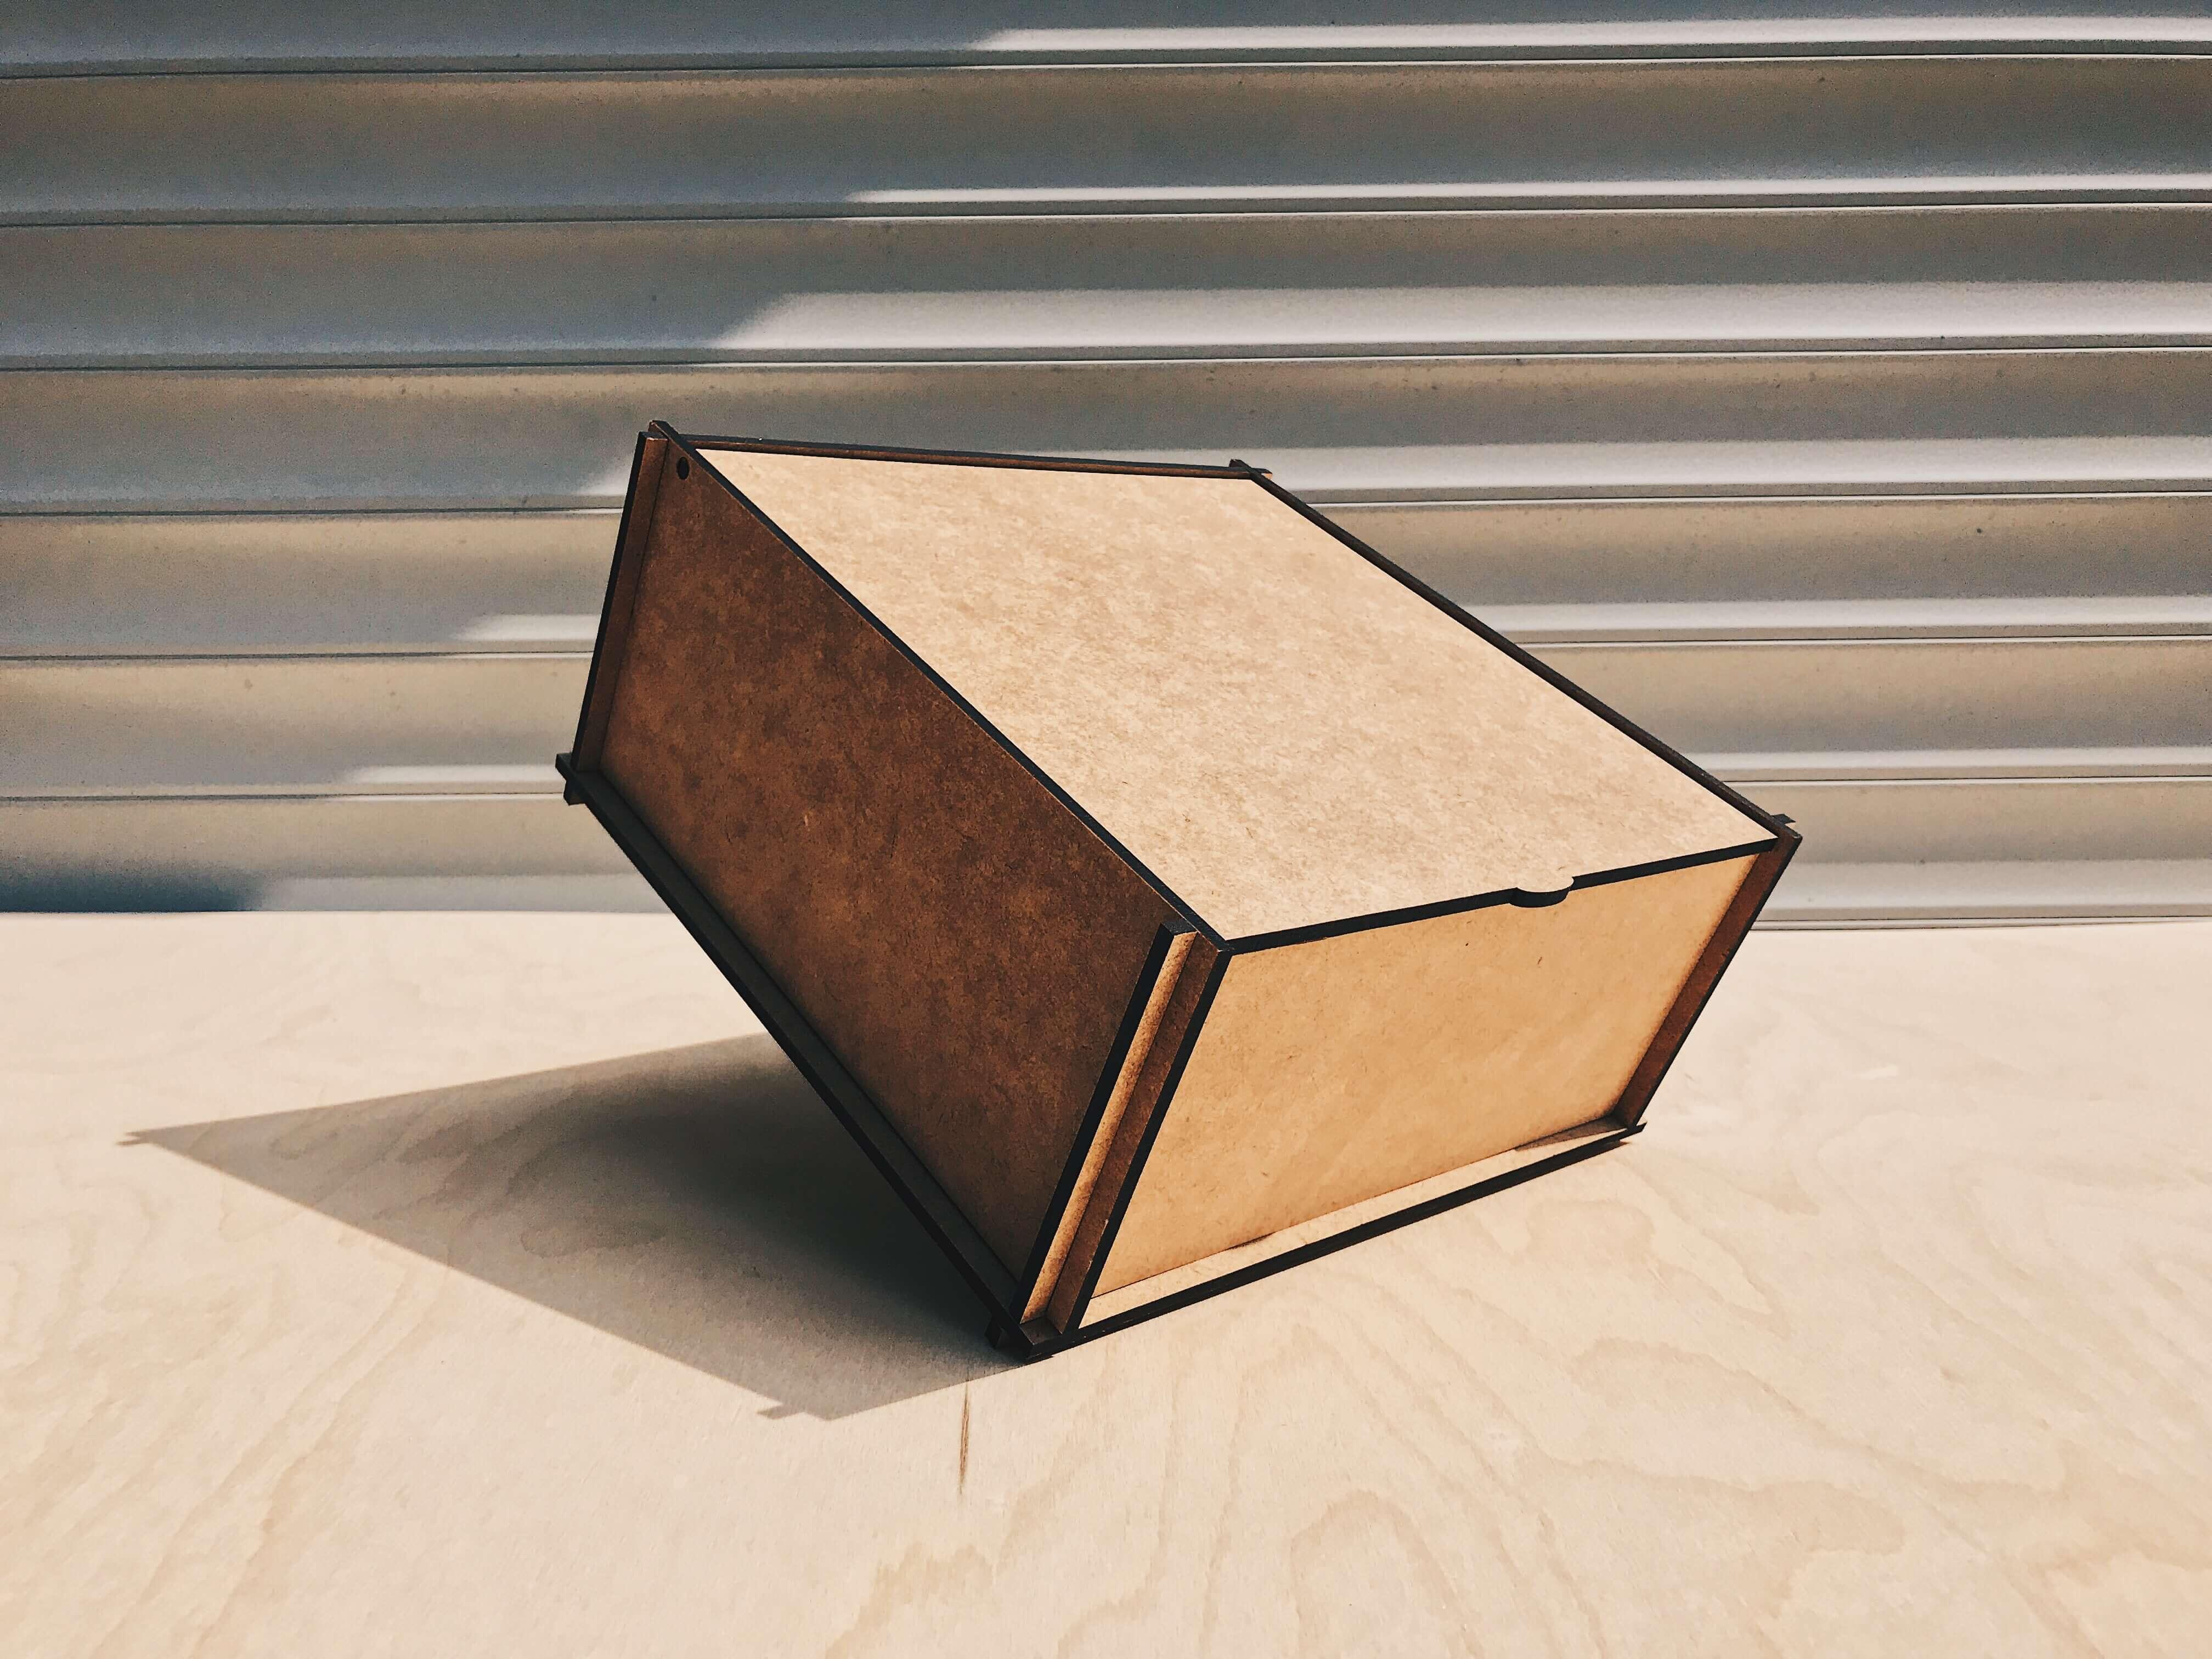 biencraft - лазерная резка и гравировка 16